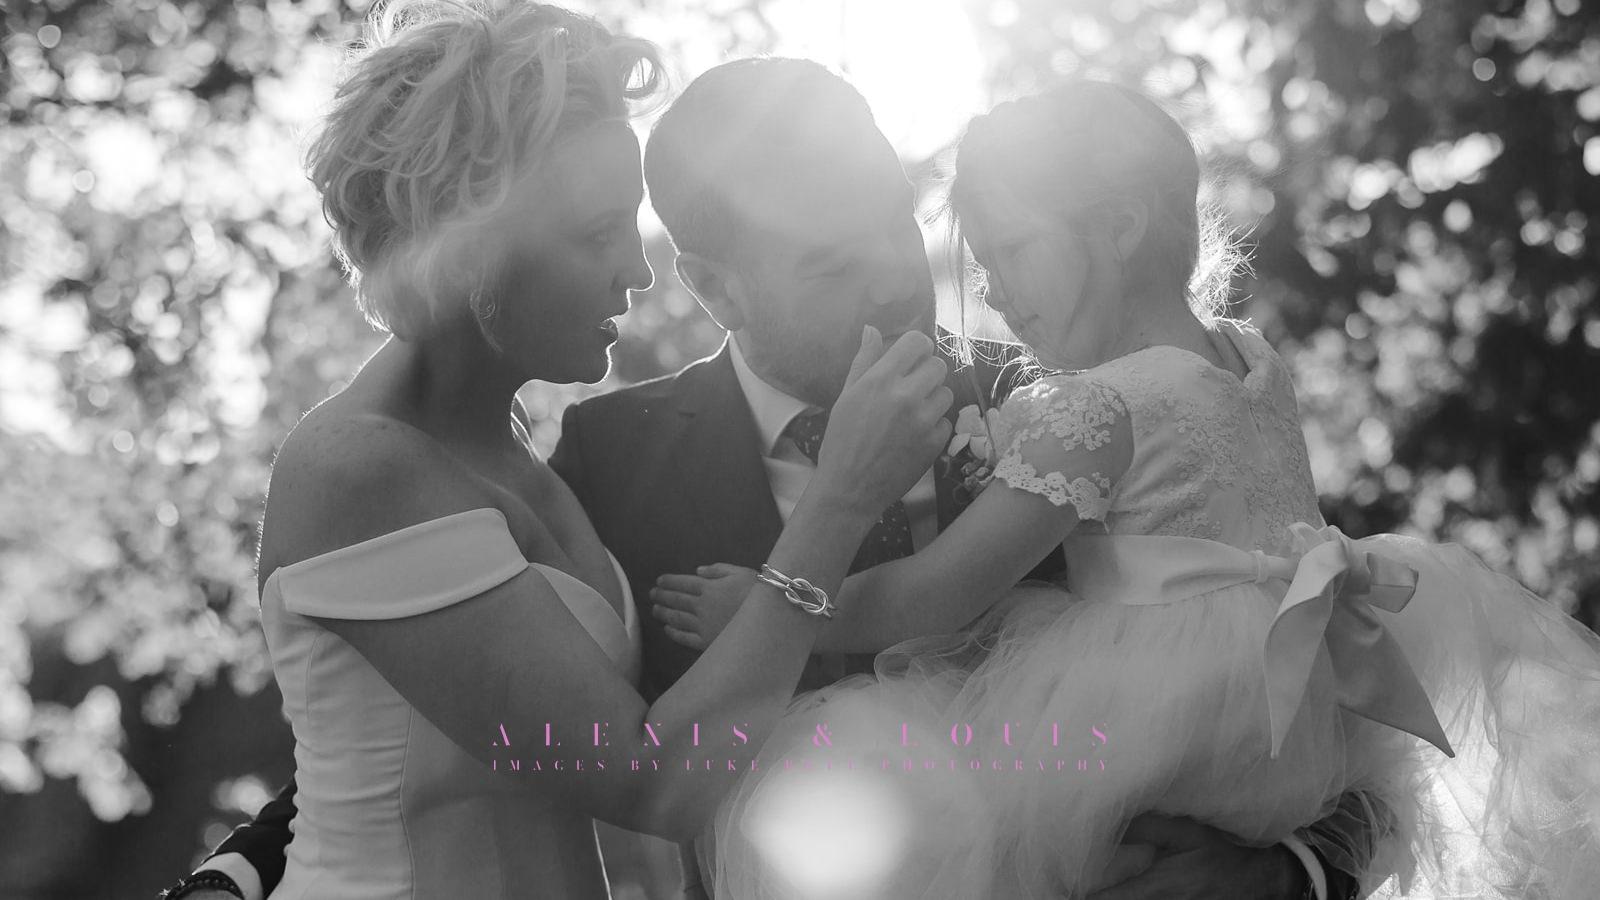 Pauntley Court Wedding Photography – Alexis + Louis